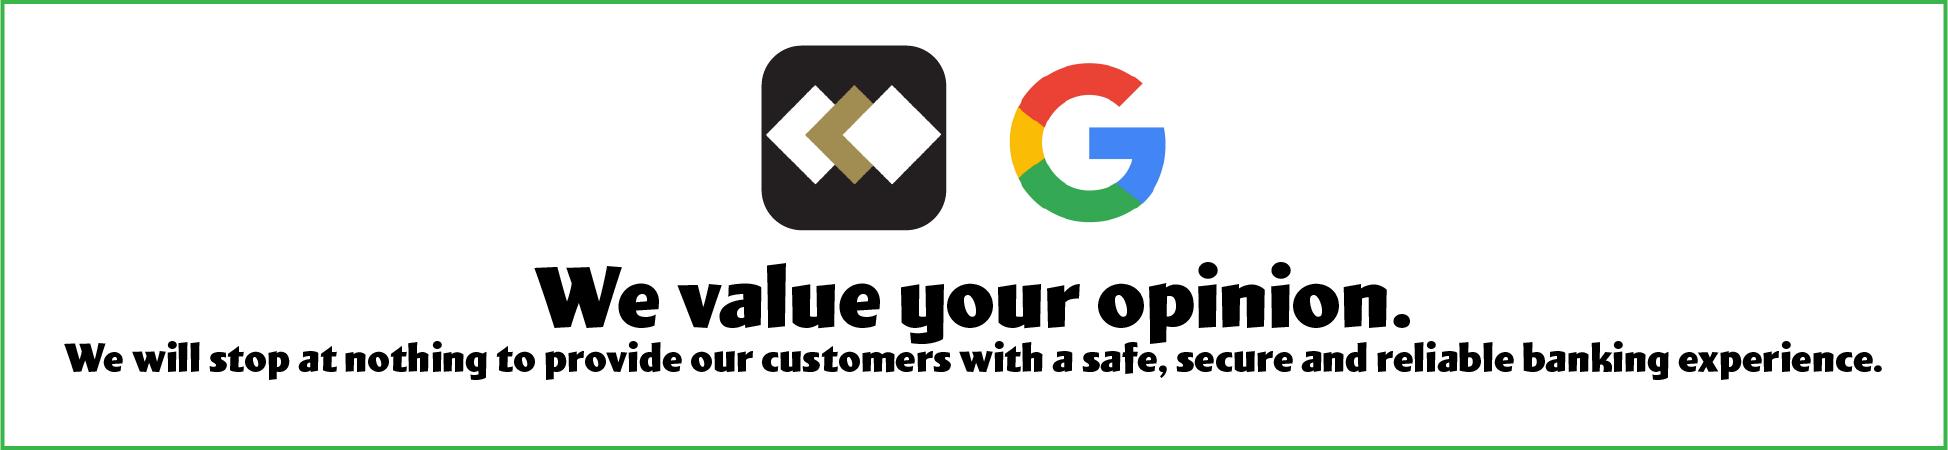 SBR logo. Google logo.